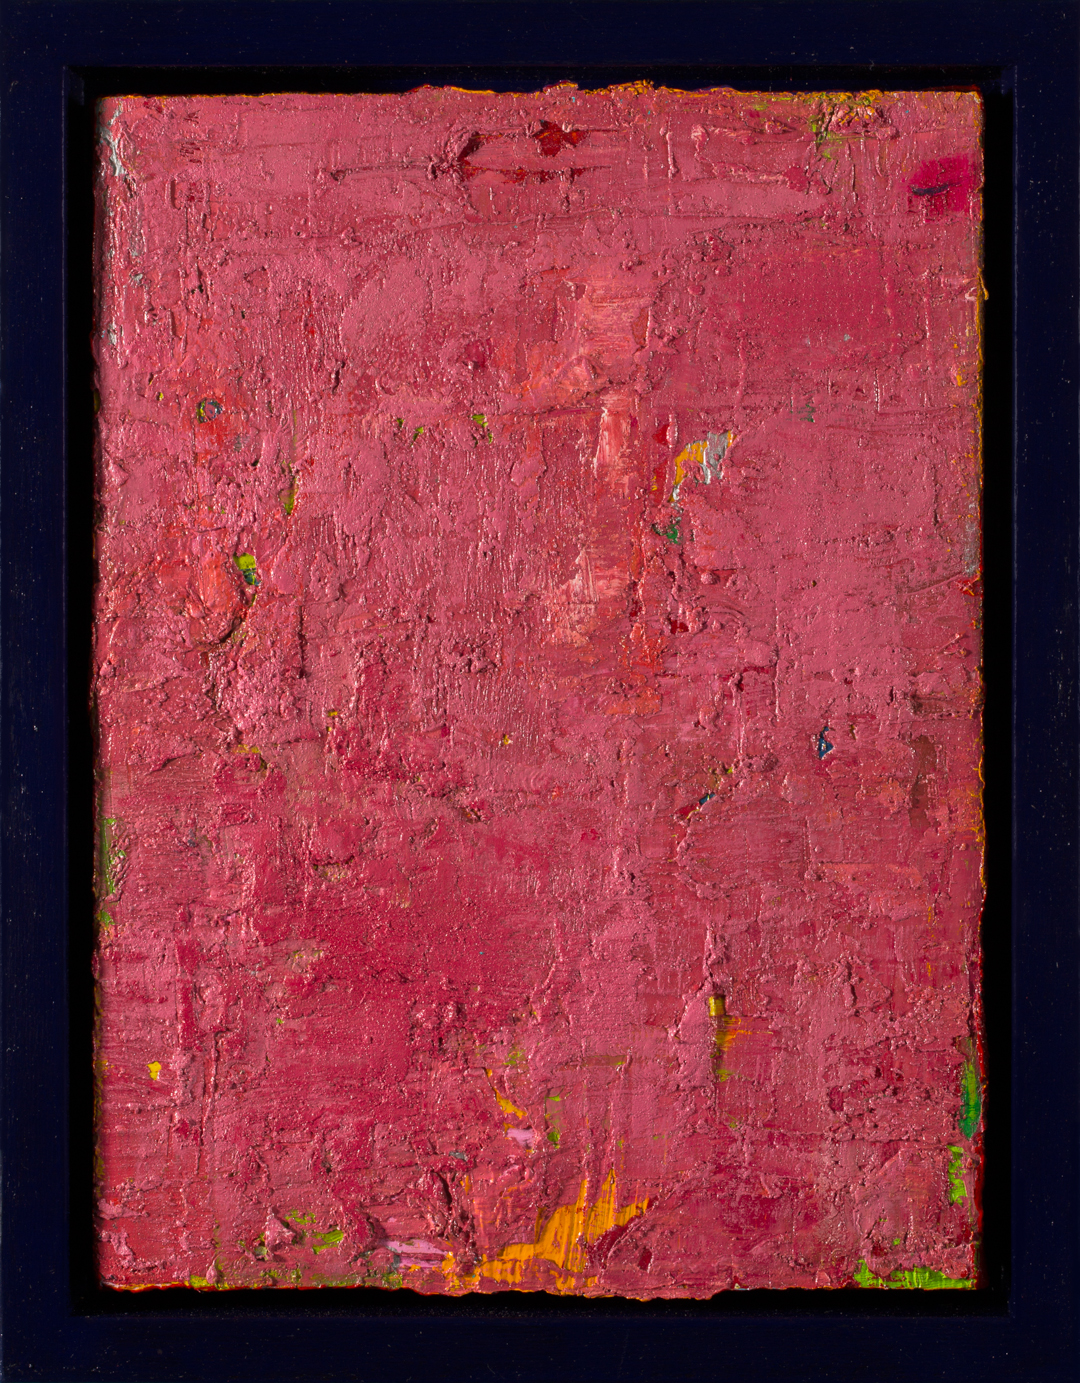 Sherbet Sky, 2015, oil on canvas, acrylic on timber frame, 35.5 x 28 x 5.5cm